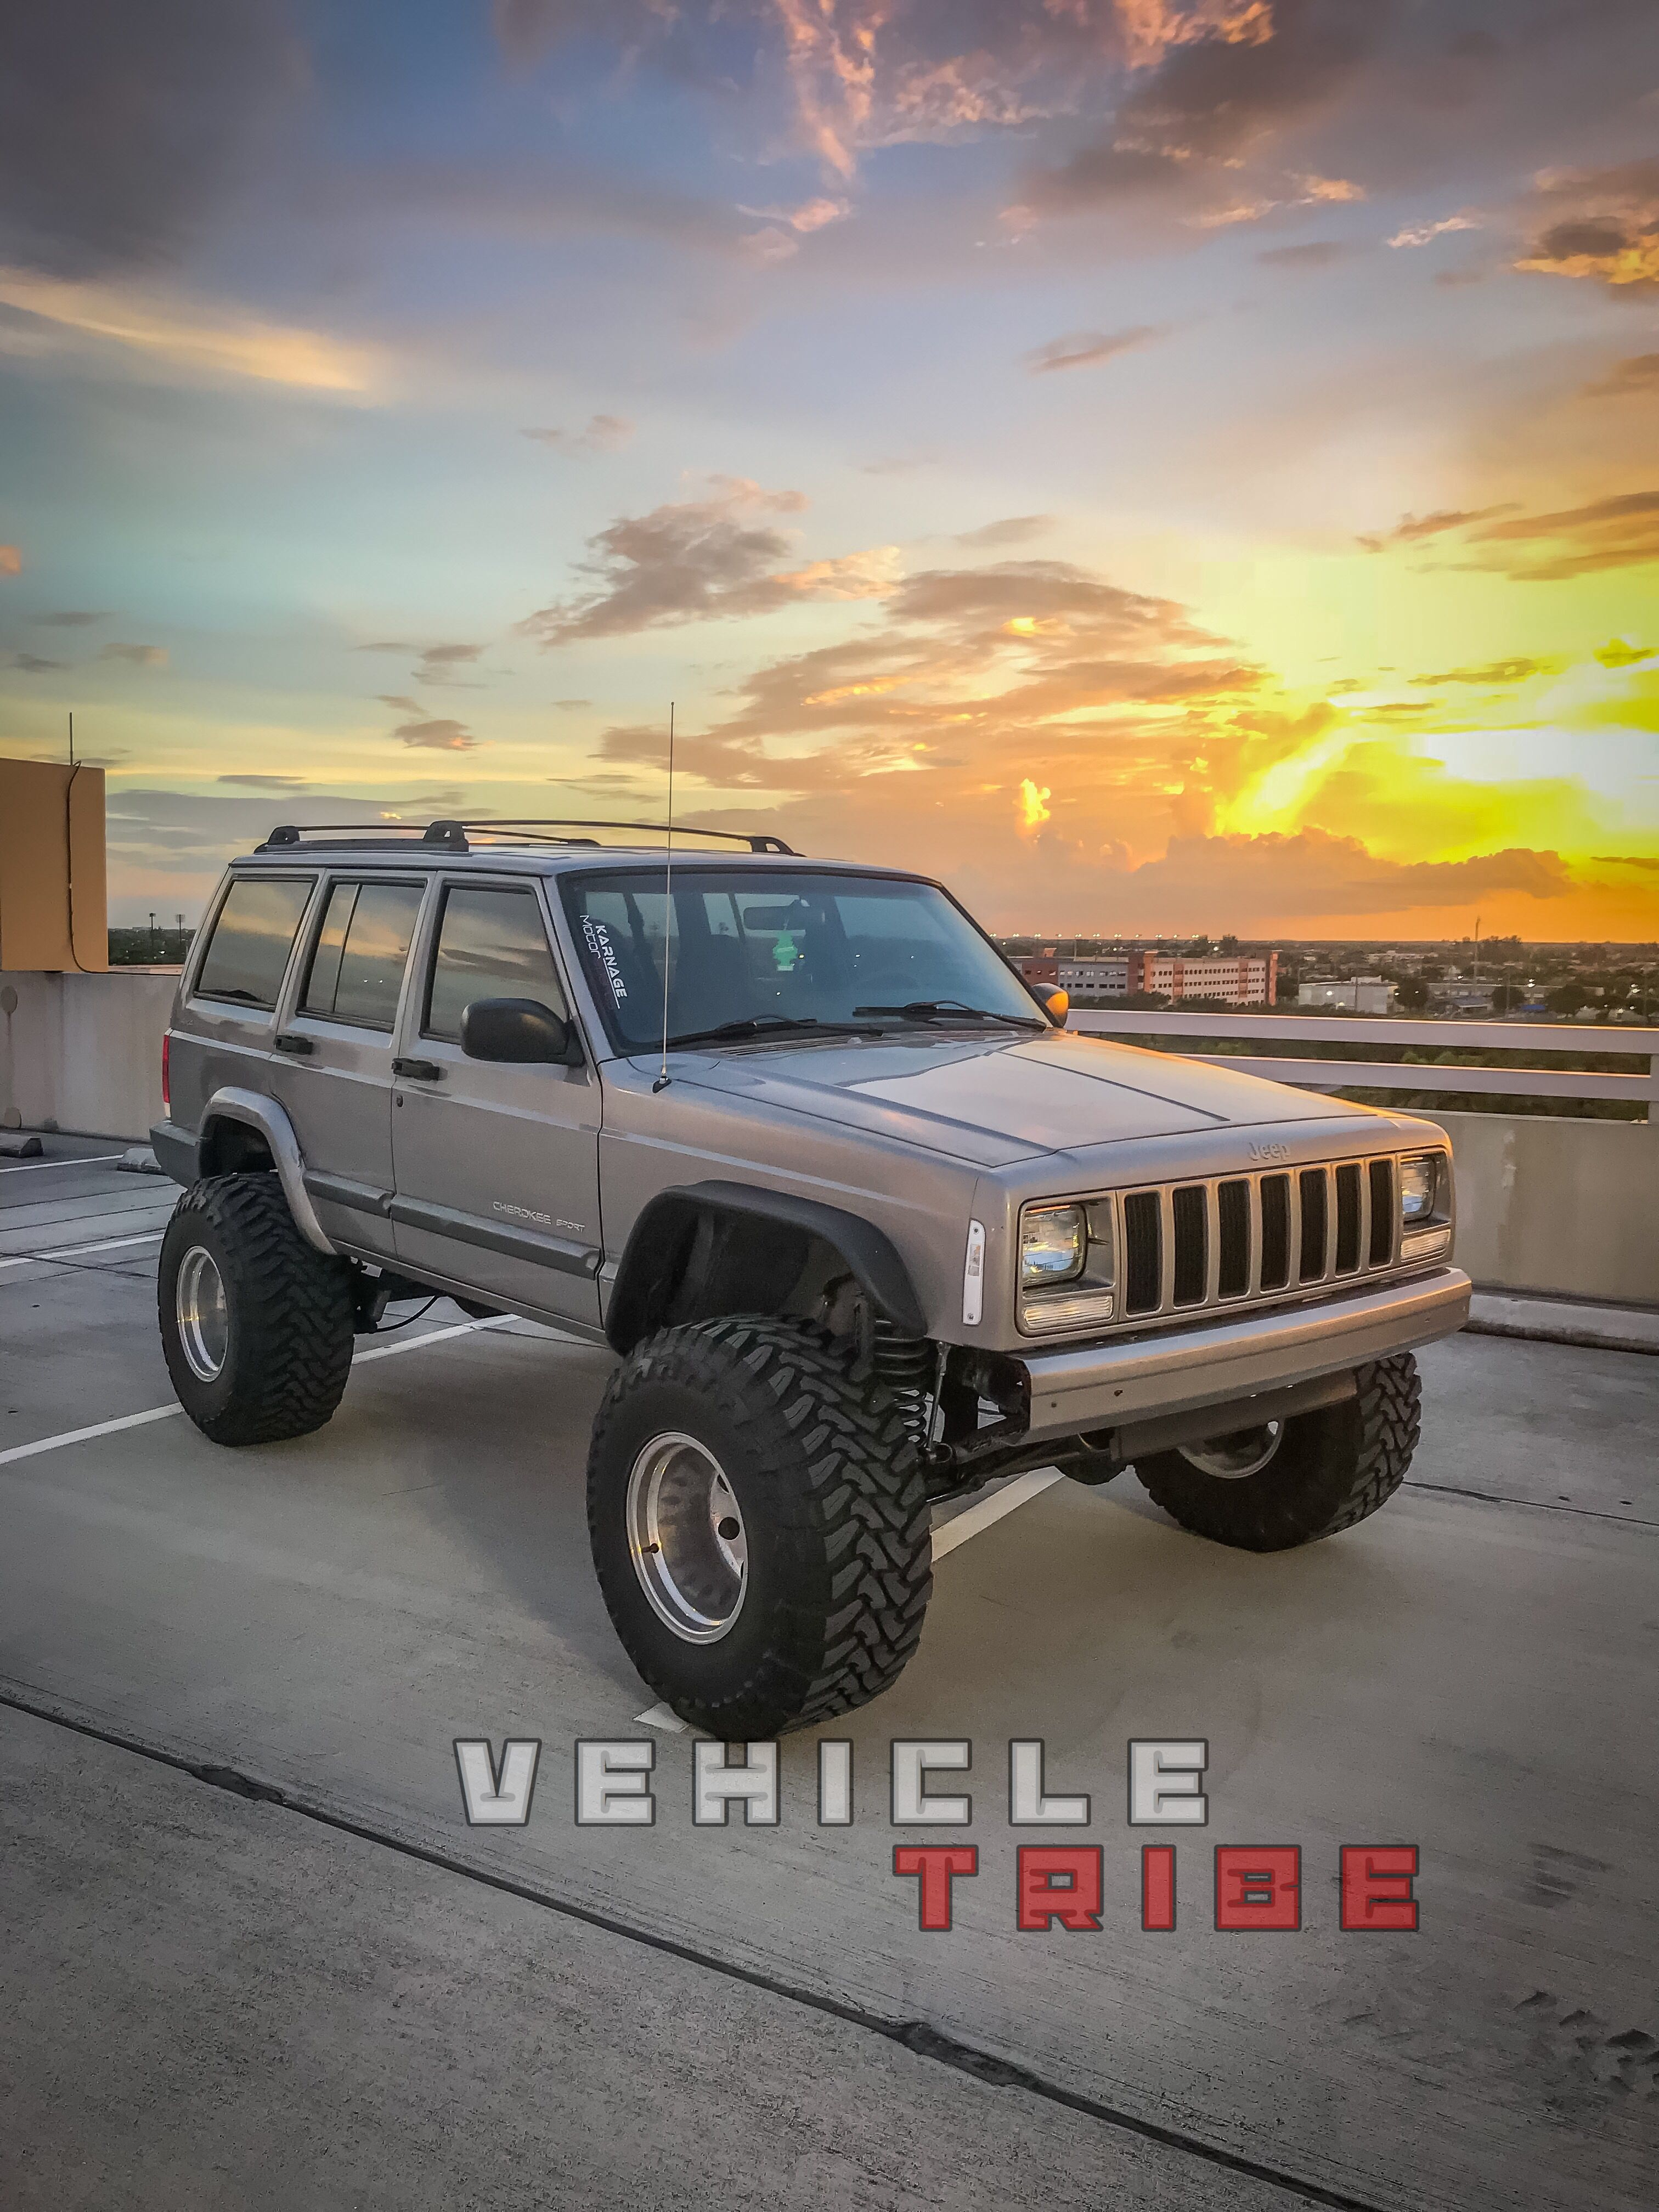 Jeep Cherokee Xj Project Youtube Jeep Cherokee Jeep Cherokee Xj Jeep Xj